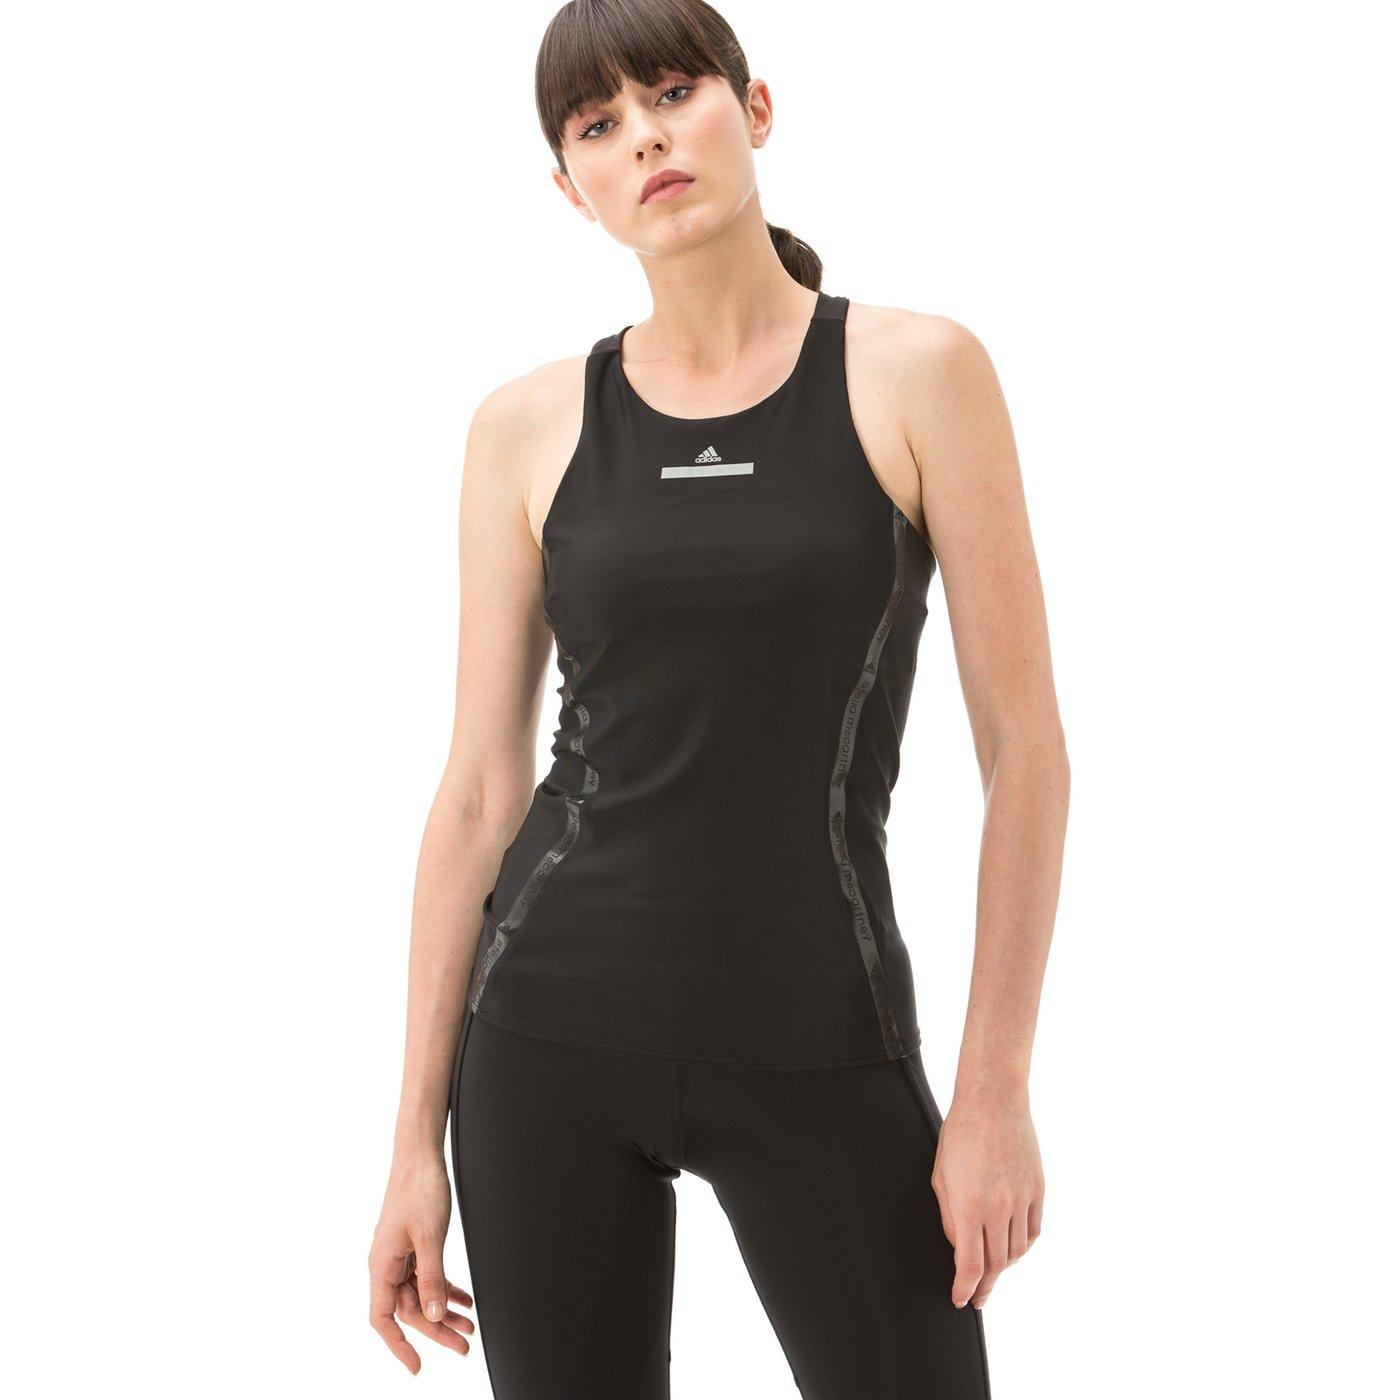 adidas Stella McCartney Kadın Siyah Atlet